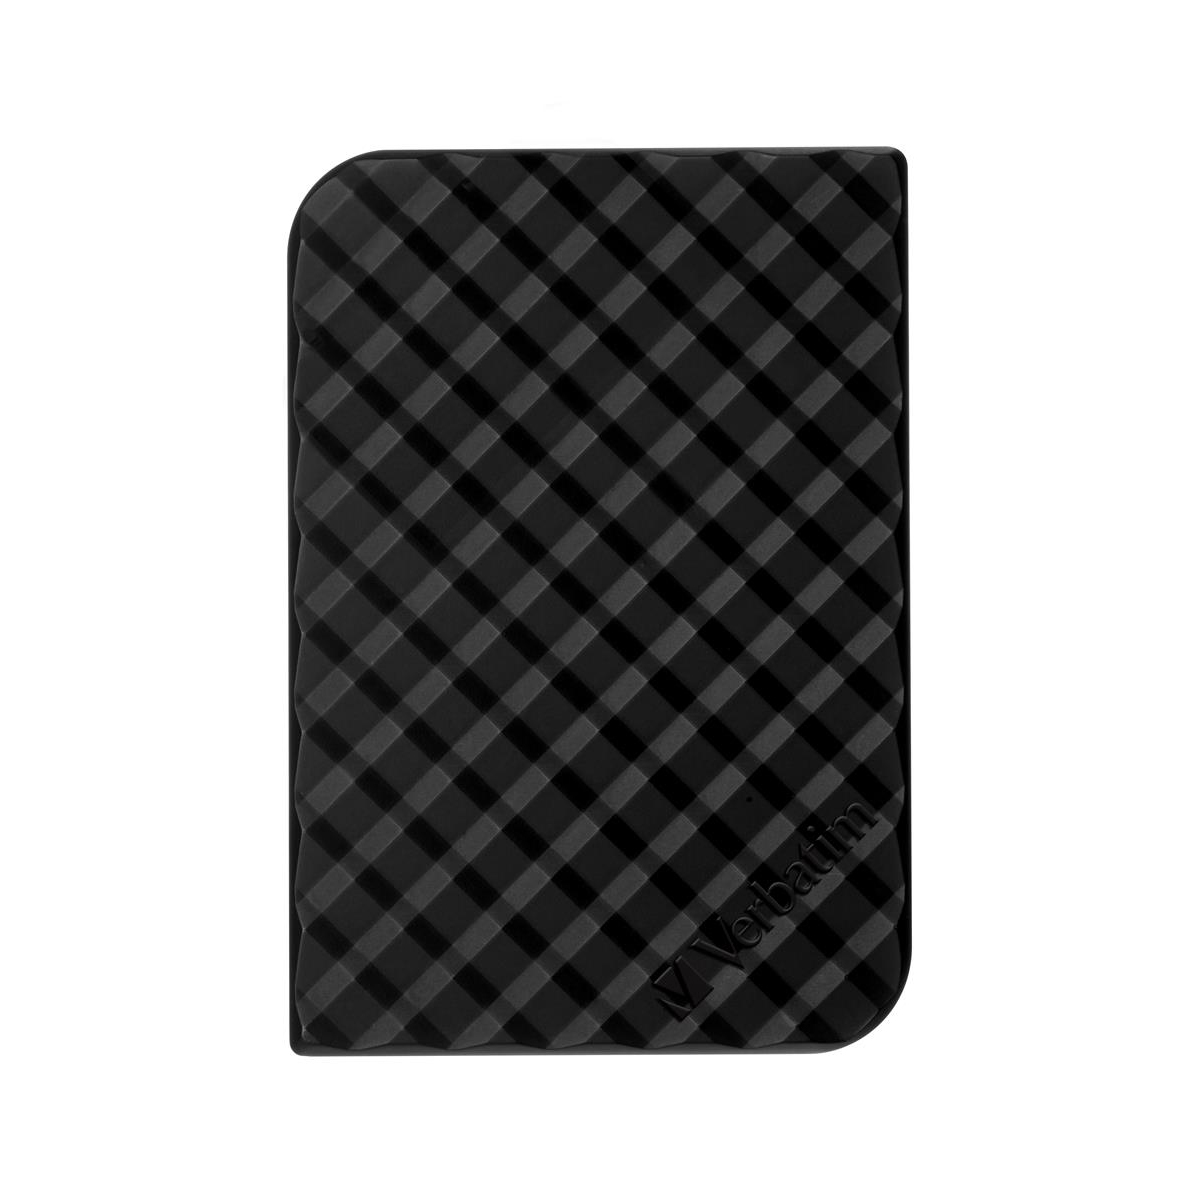 Verbatim Portable Hard Drive 1TB Black Ref 53194